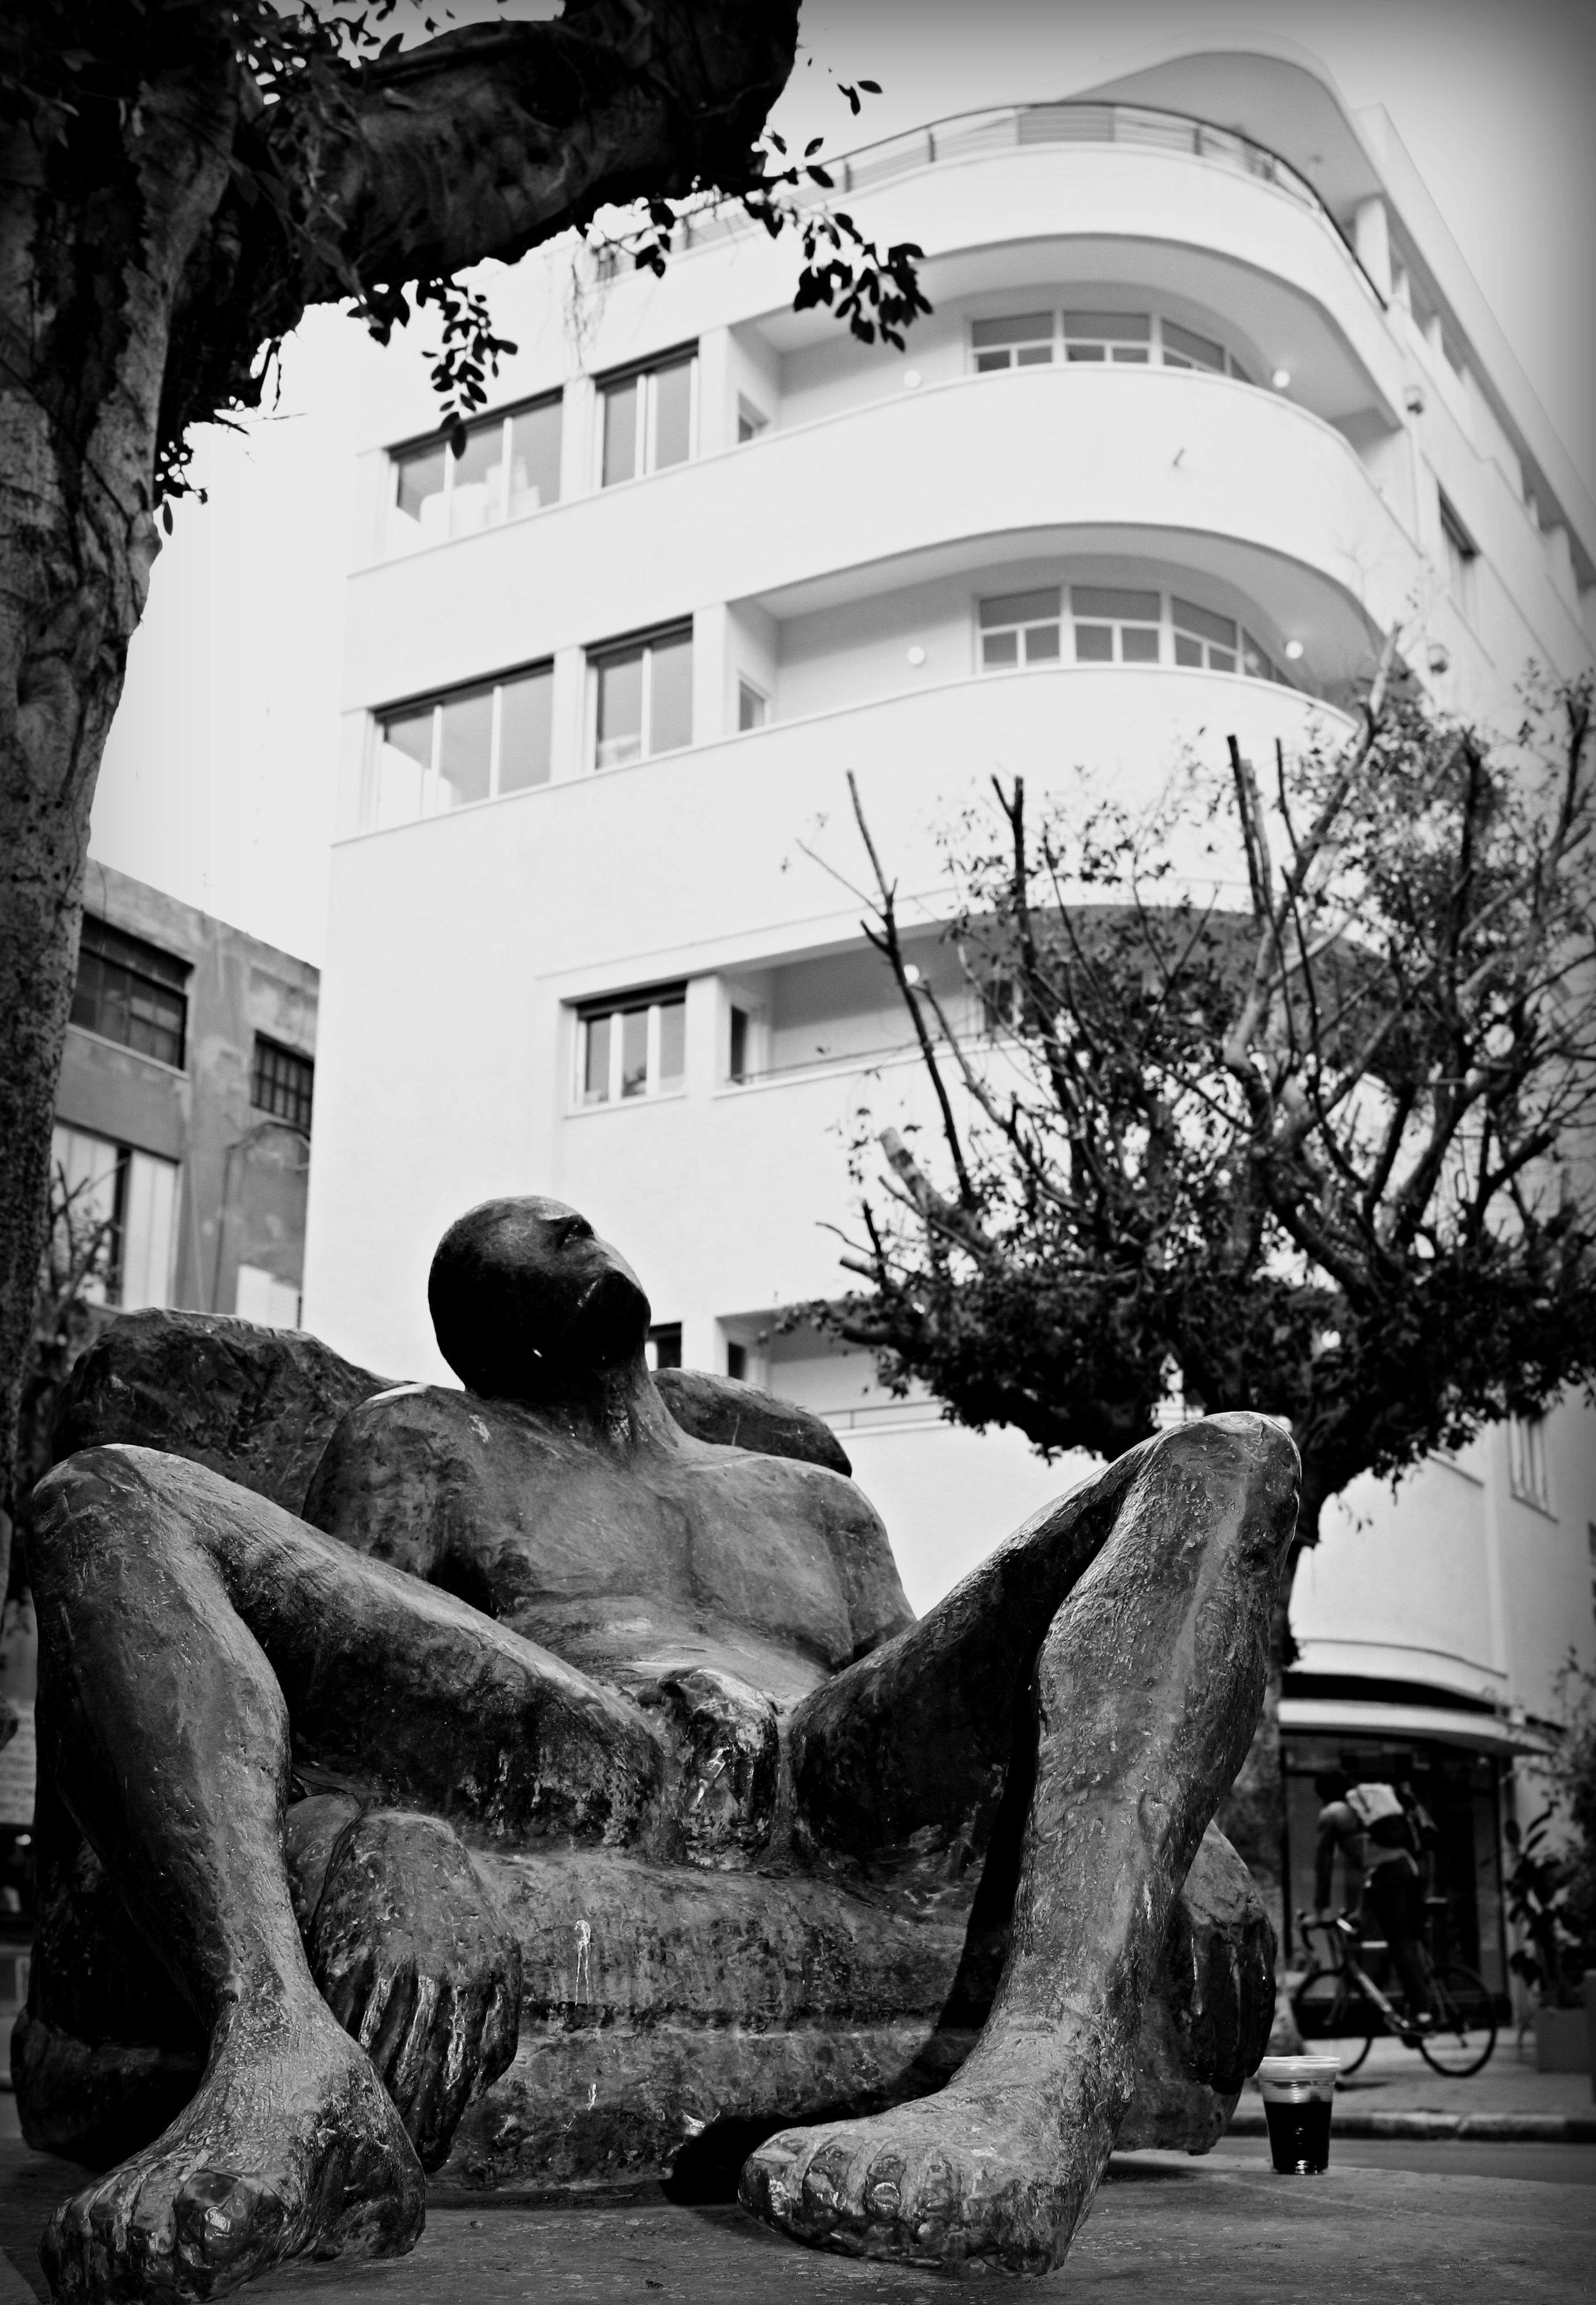 White City & Bauhaus Architecture